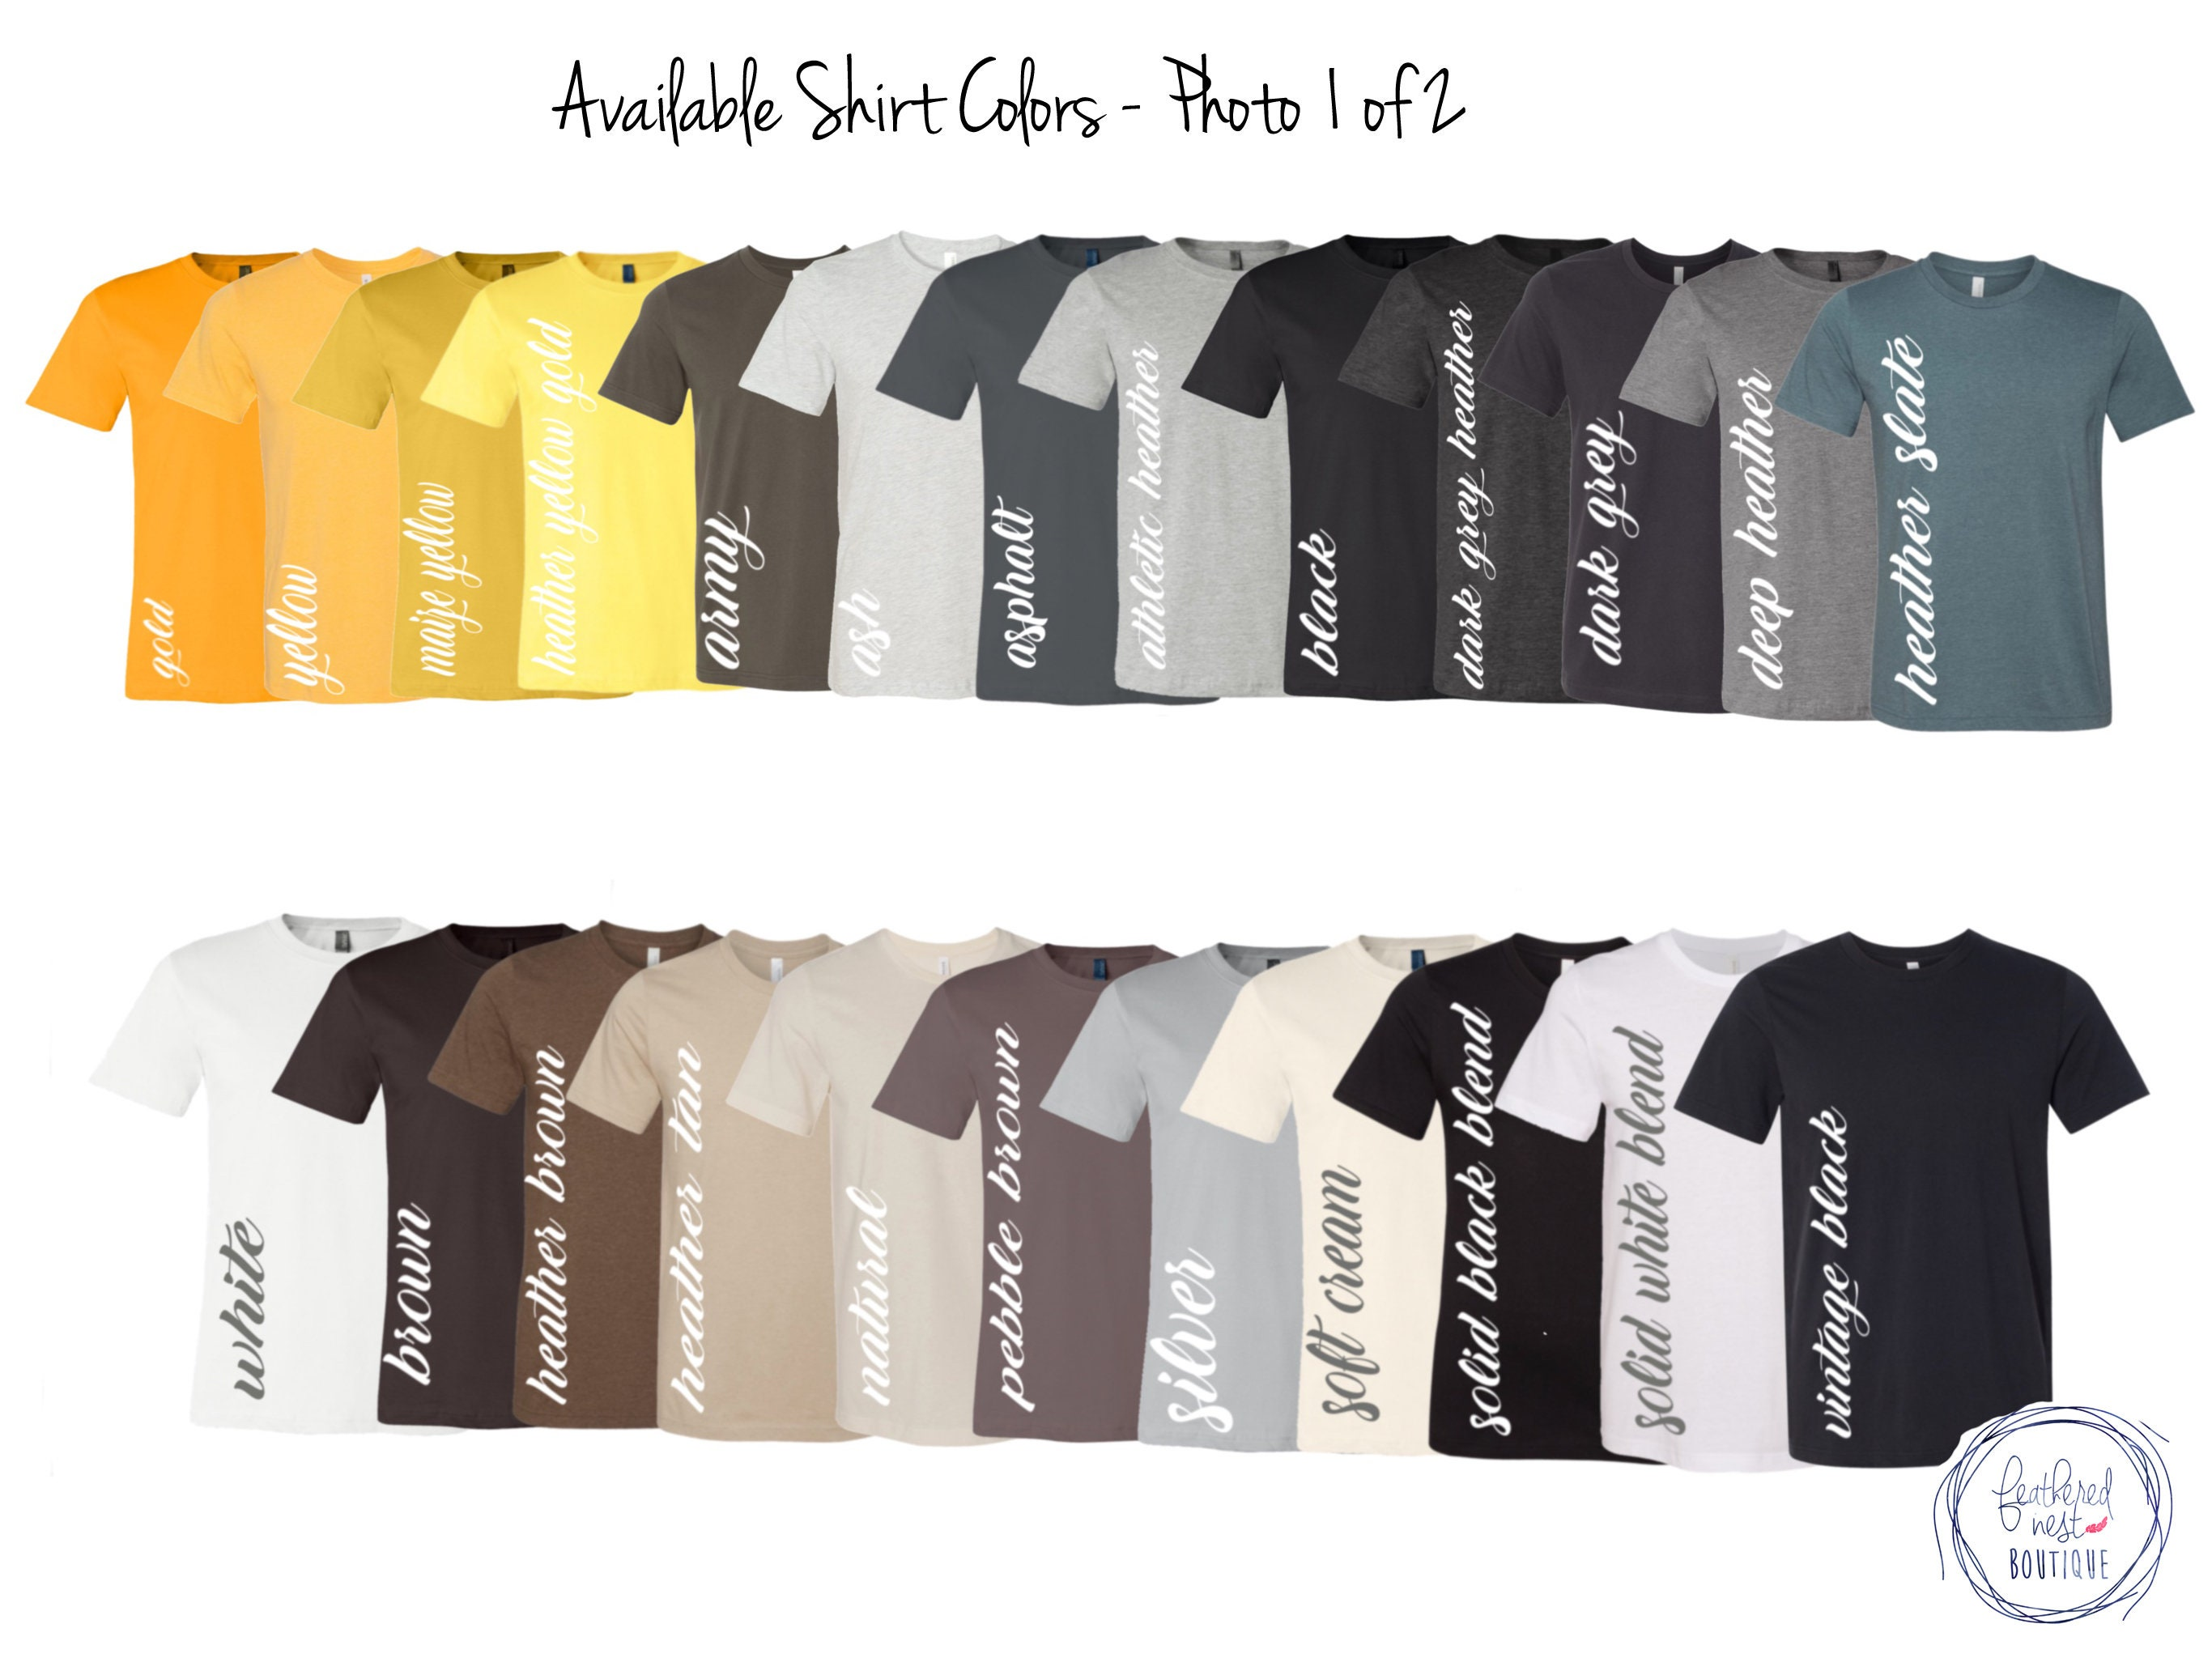 c6fe766434 Basic 24:7 Short Sleeved Shirt - Monograms Leggings Lattes Short Sleeve Tee  - Fall Shirt - Unisex Triblend Short Sleeve Tee - Funny Fall tee